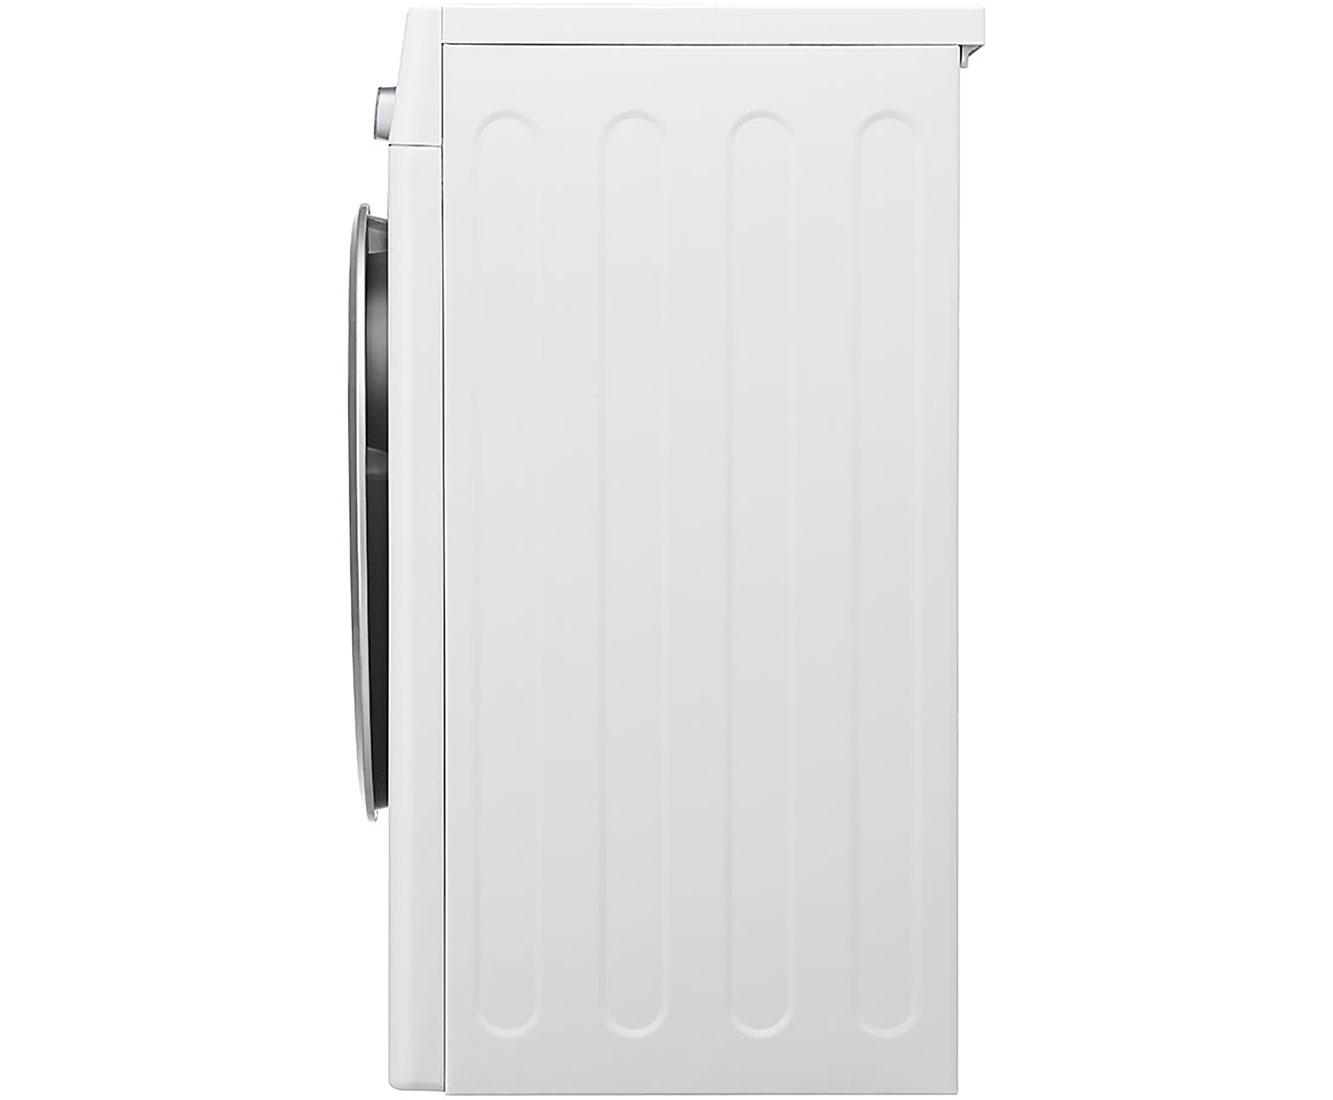 LG F12WD74SLIM Waschtrockner